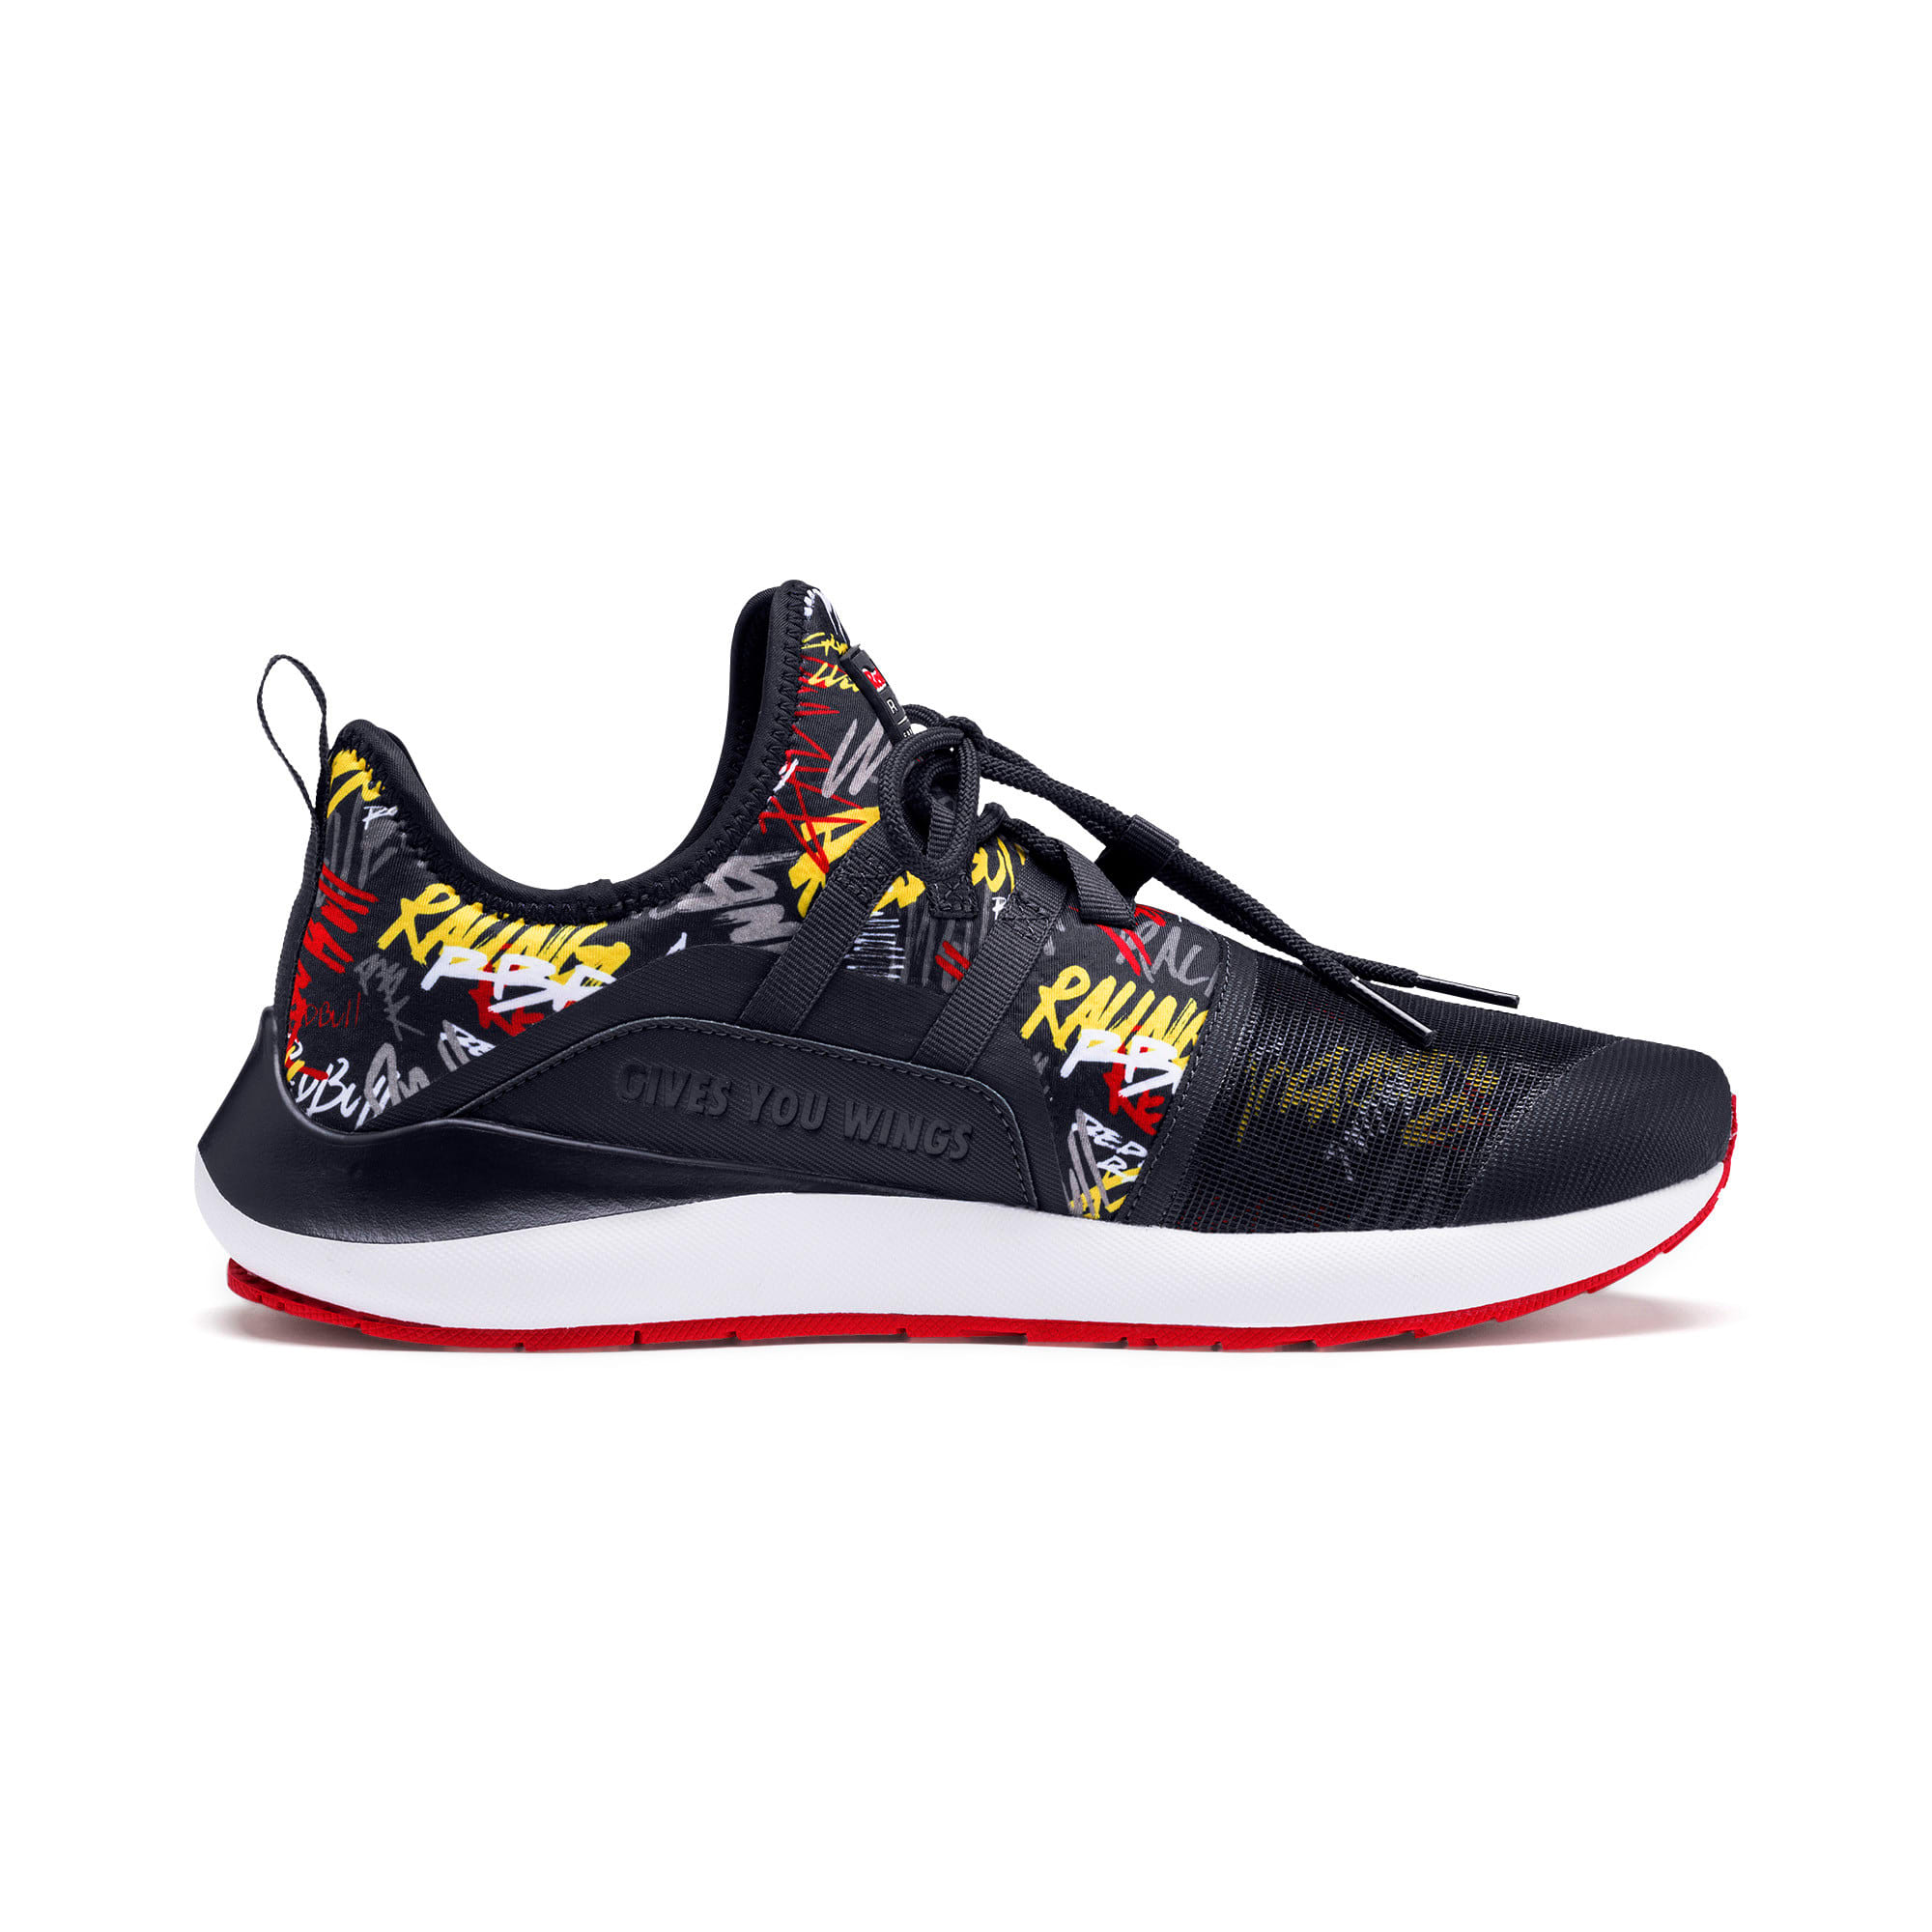 Thumbnail 6 of Red Bull Racing Evo Cat II Graphic Men's Training Shoes, NIGHT SKY-White-Chinese Red, medium